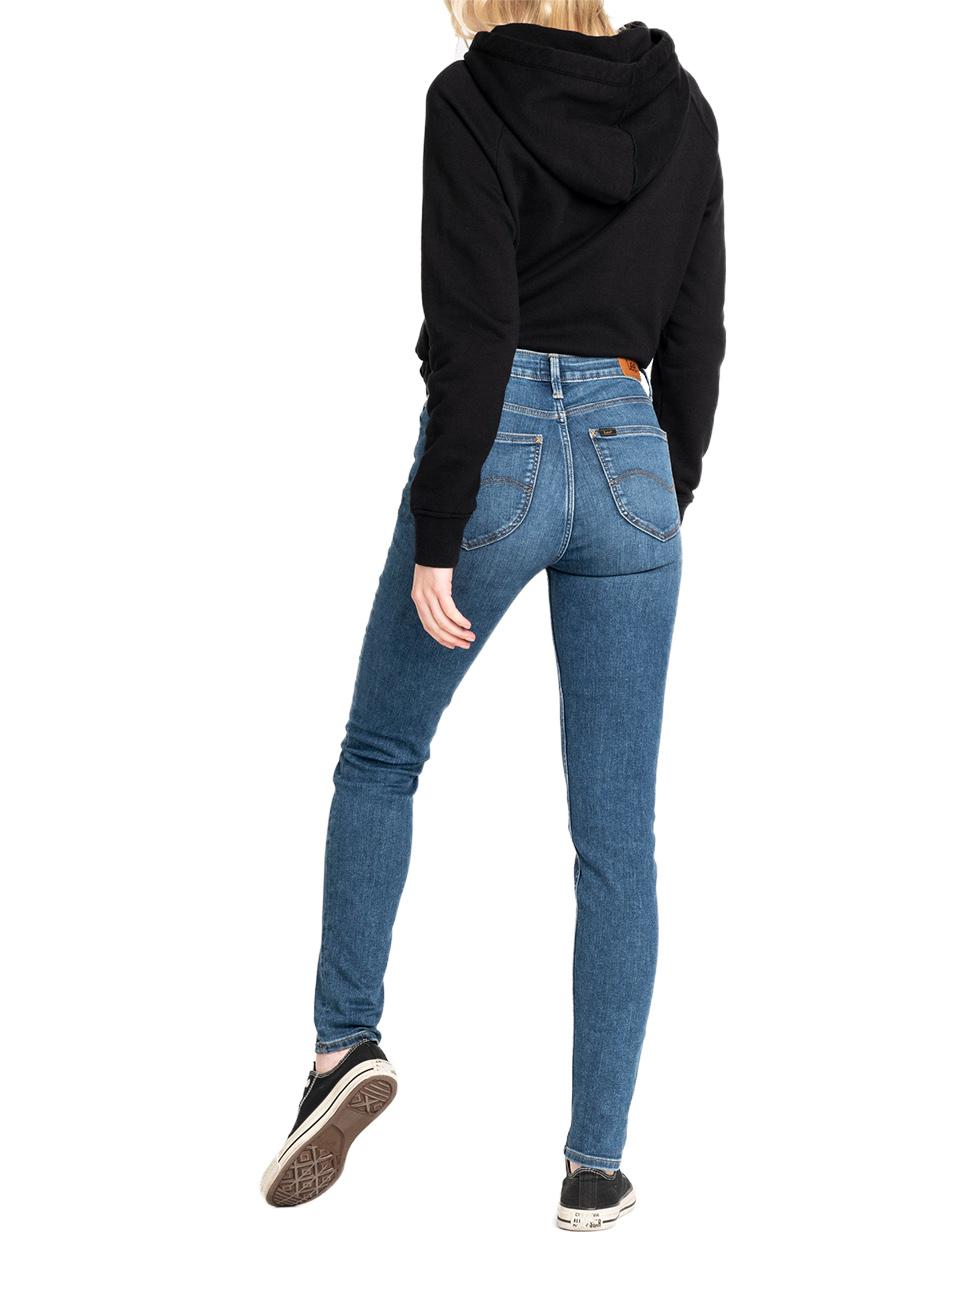 lee-damen-jeans-jeanshose-stretch-scarlett-high-skinny-fit-blau-mid-copan